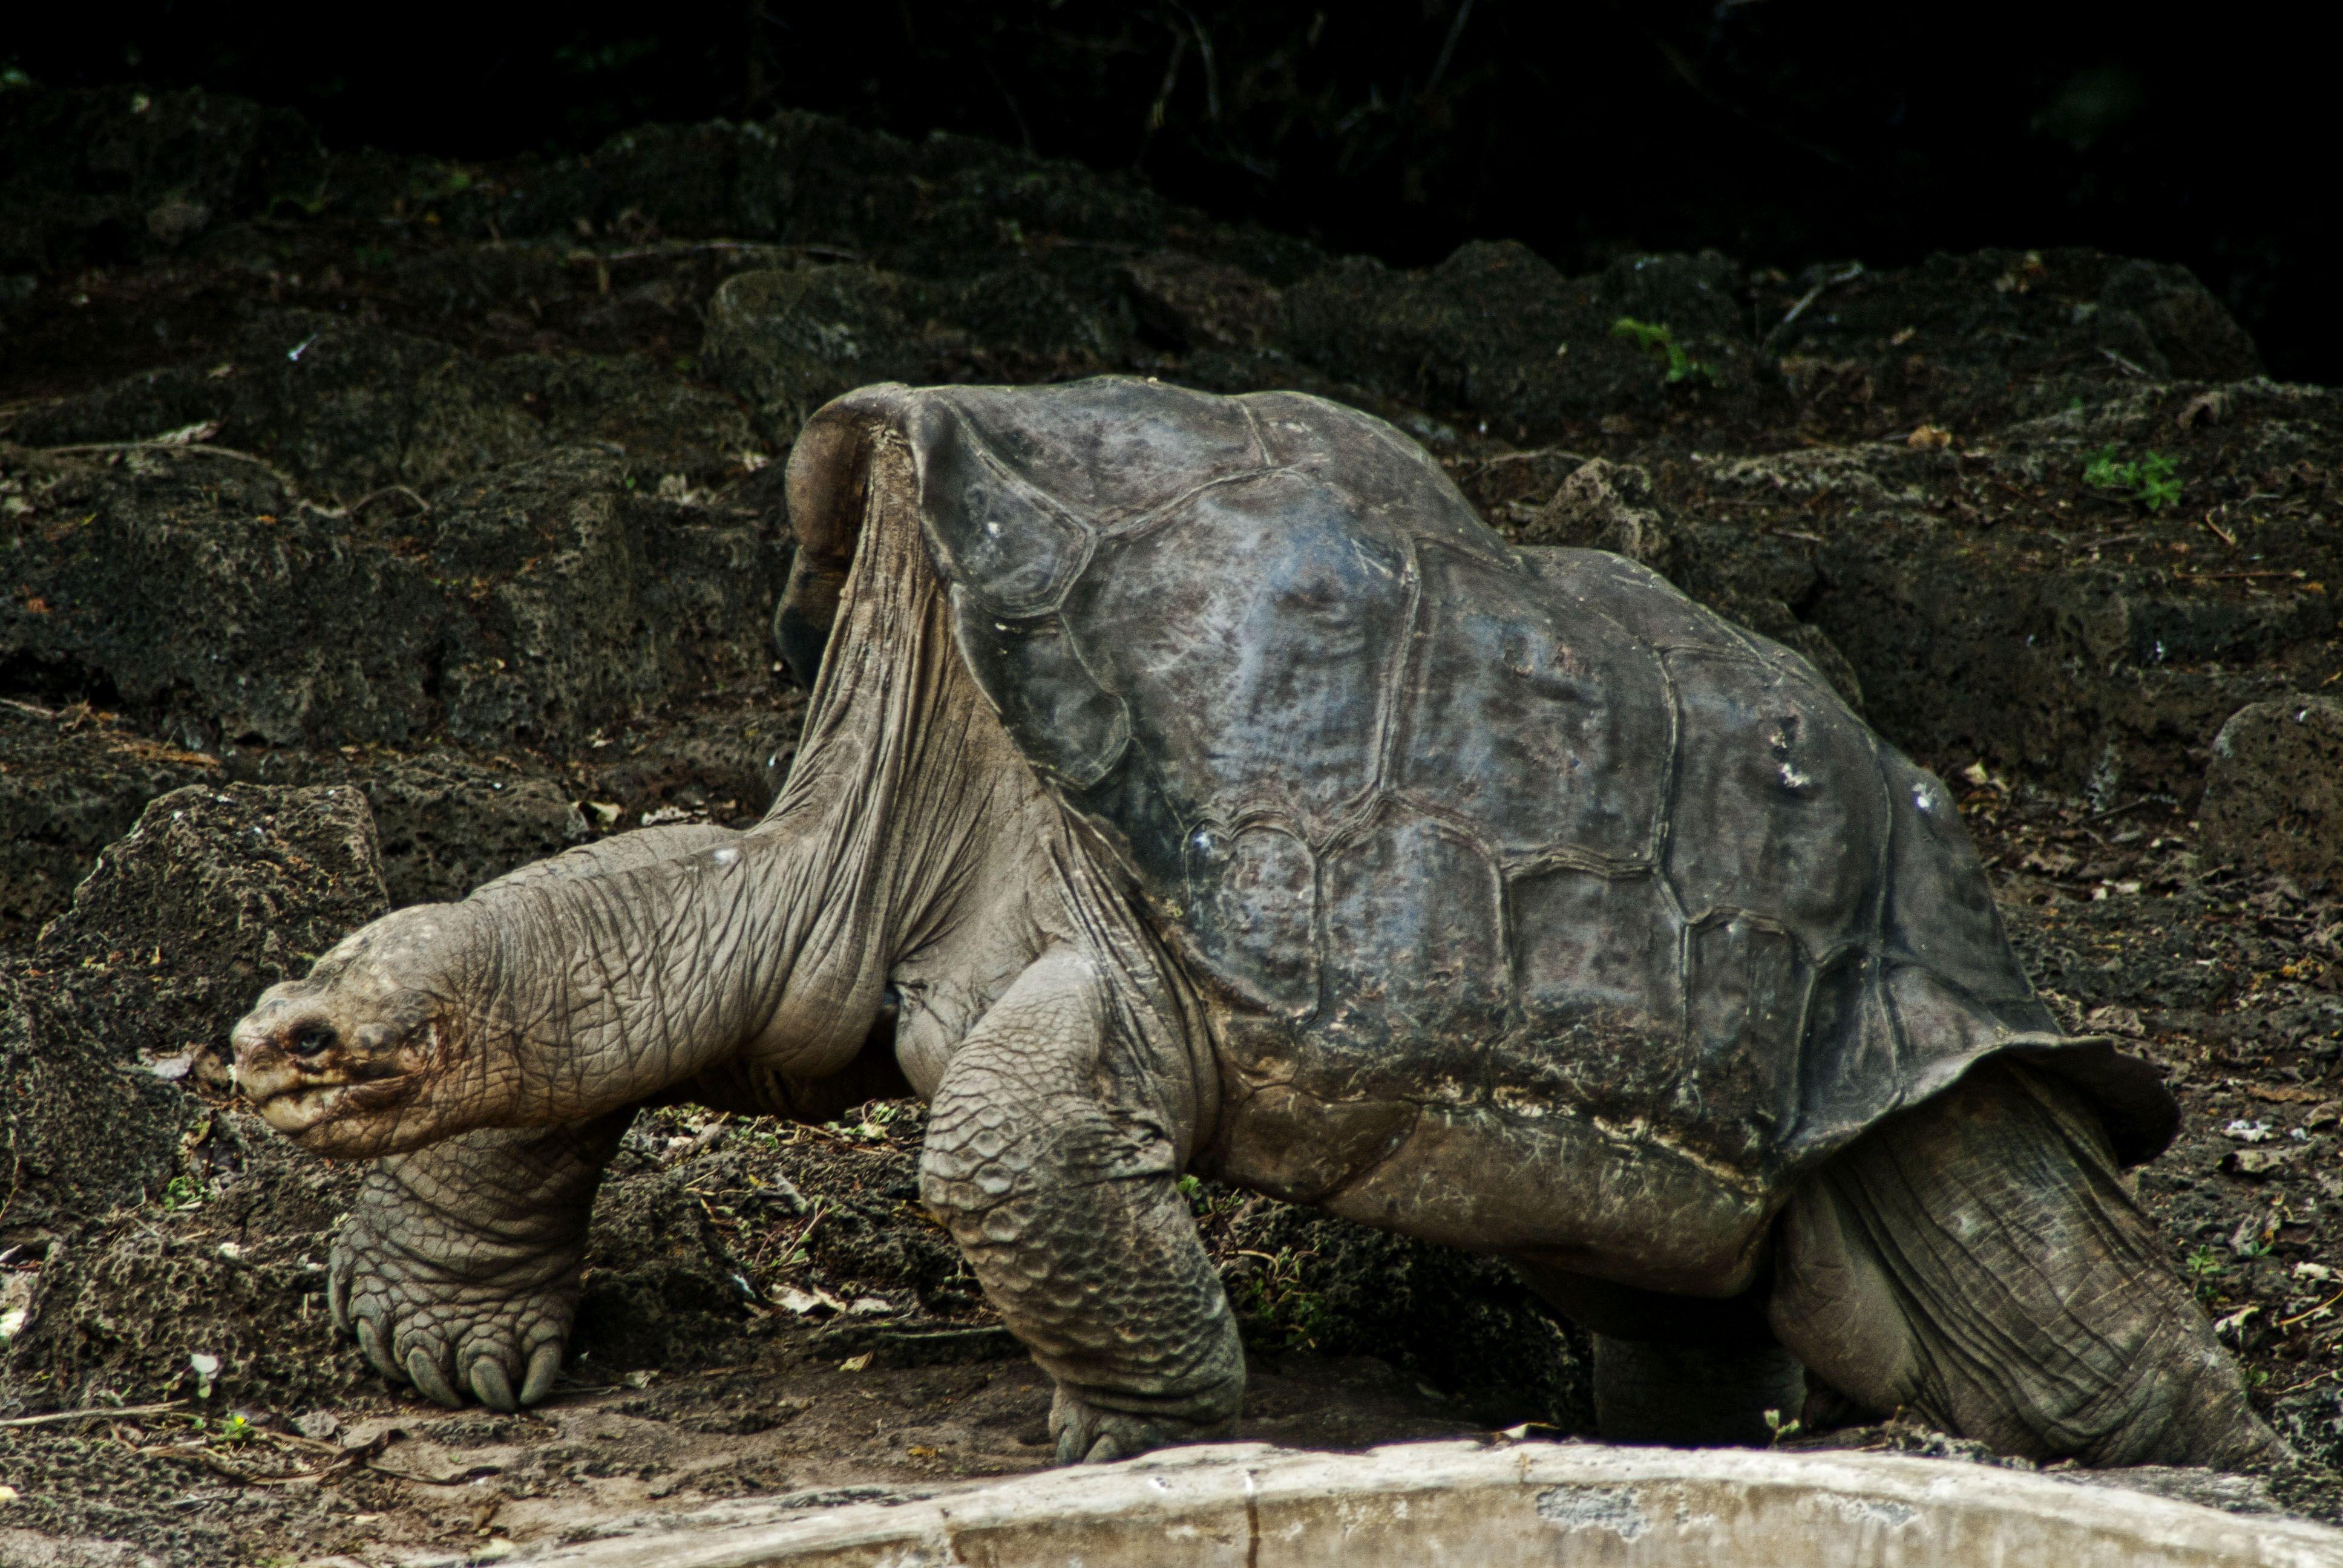 Aldabra Tortoise Hd Wallpaper 6 Jpg Jpeg Image 3872 2592 Pixels Turtle Tortoise Sulcata Tortoise